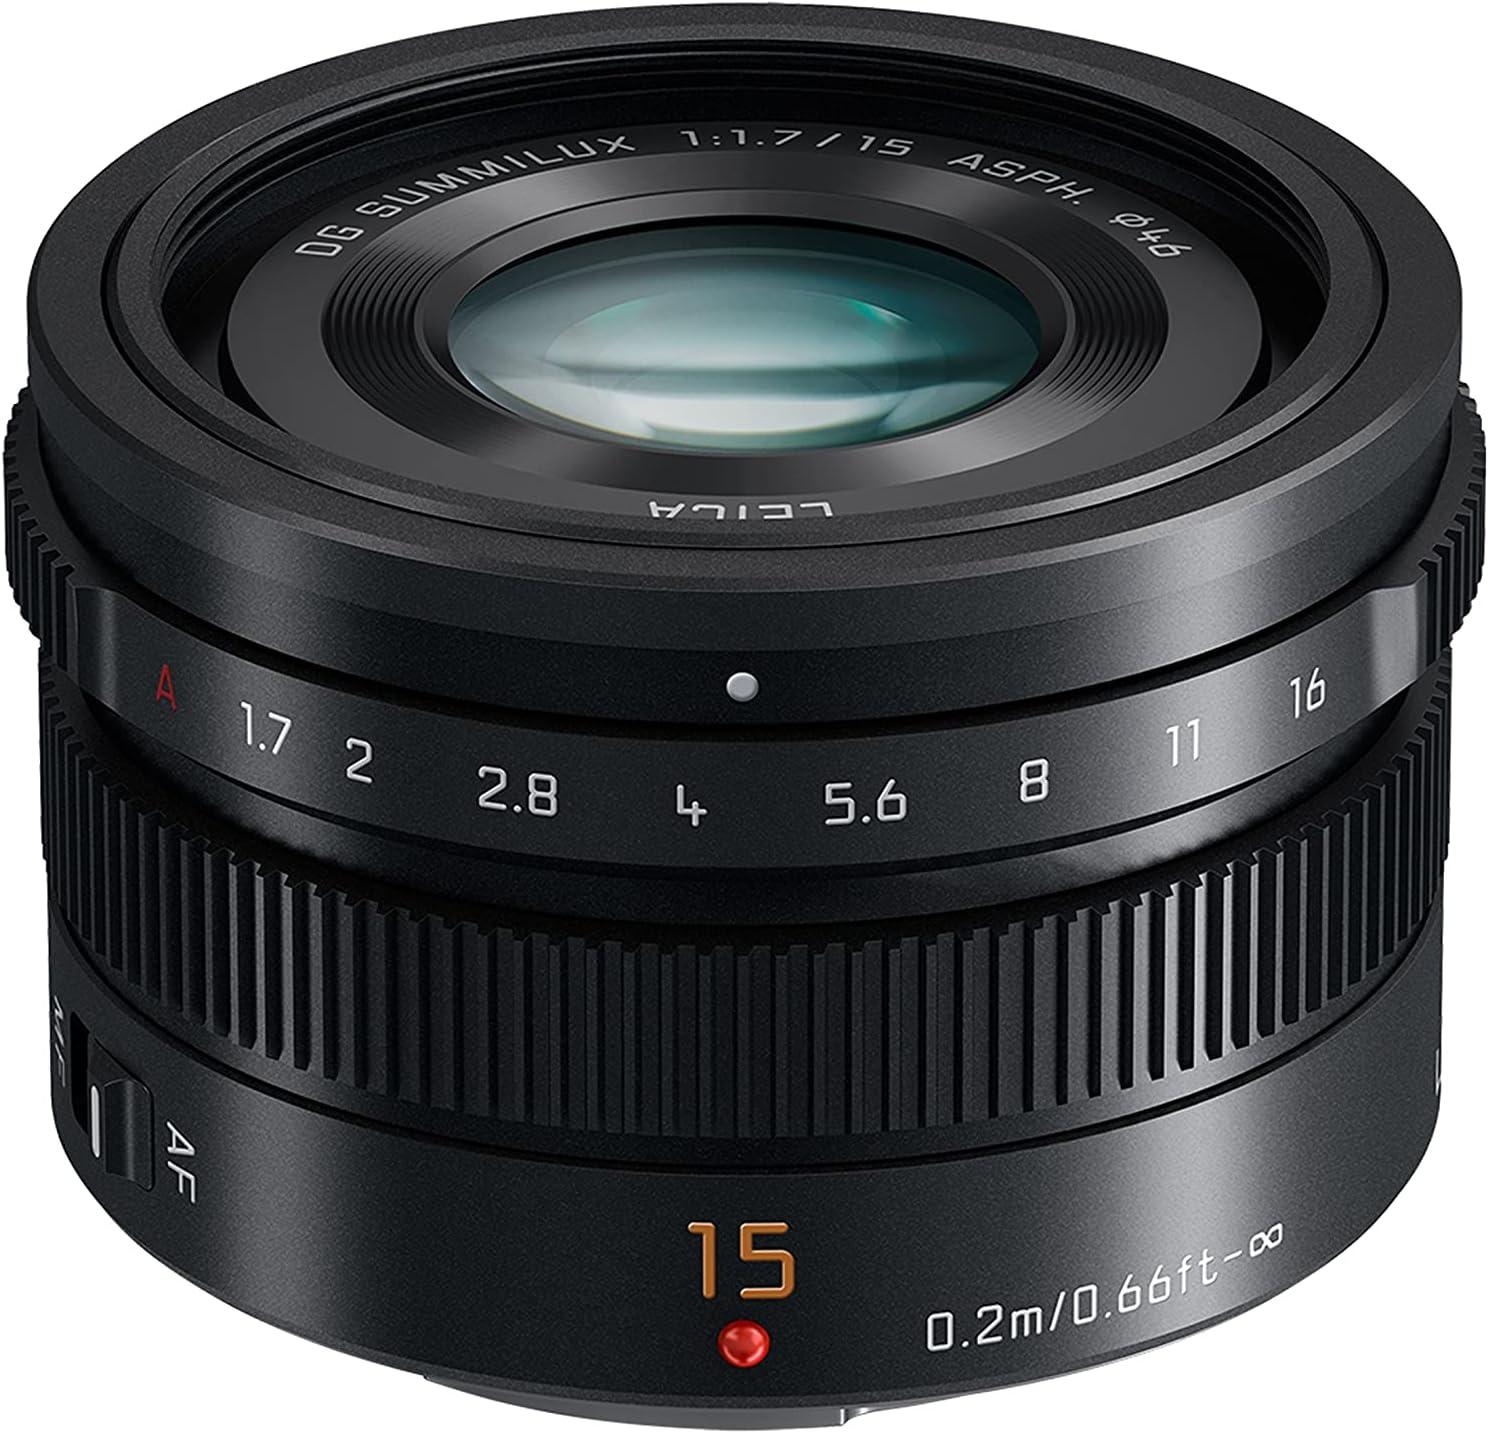 Panasonic Leica DG Summilux H-X015 - Objetivo Focal Fija para Cámaras de Montura M4/3 (Focal 15 mm, F1.7, Tamaño Filtro 46 mm, Lentes Asféricas), Negro